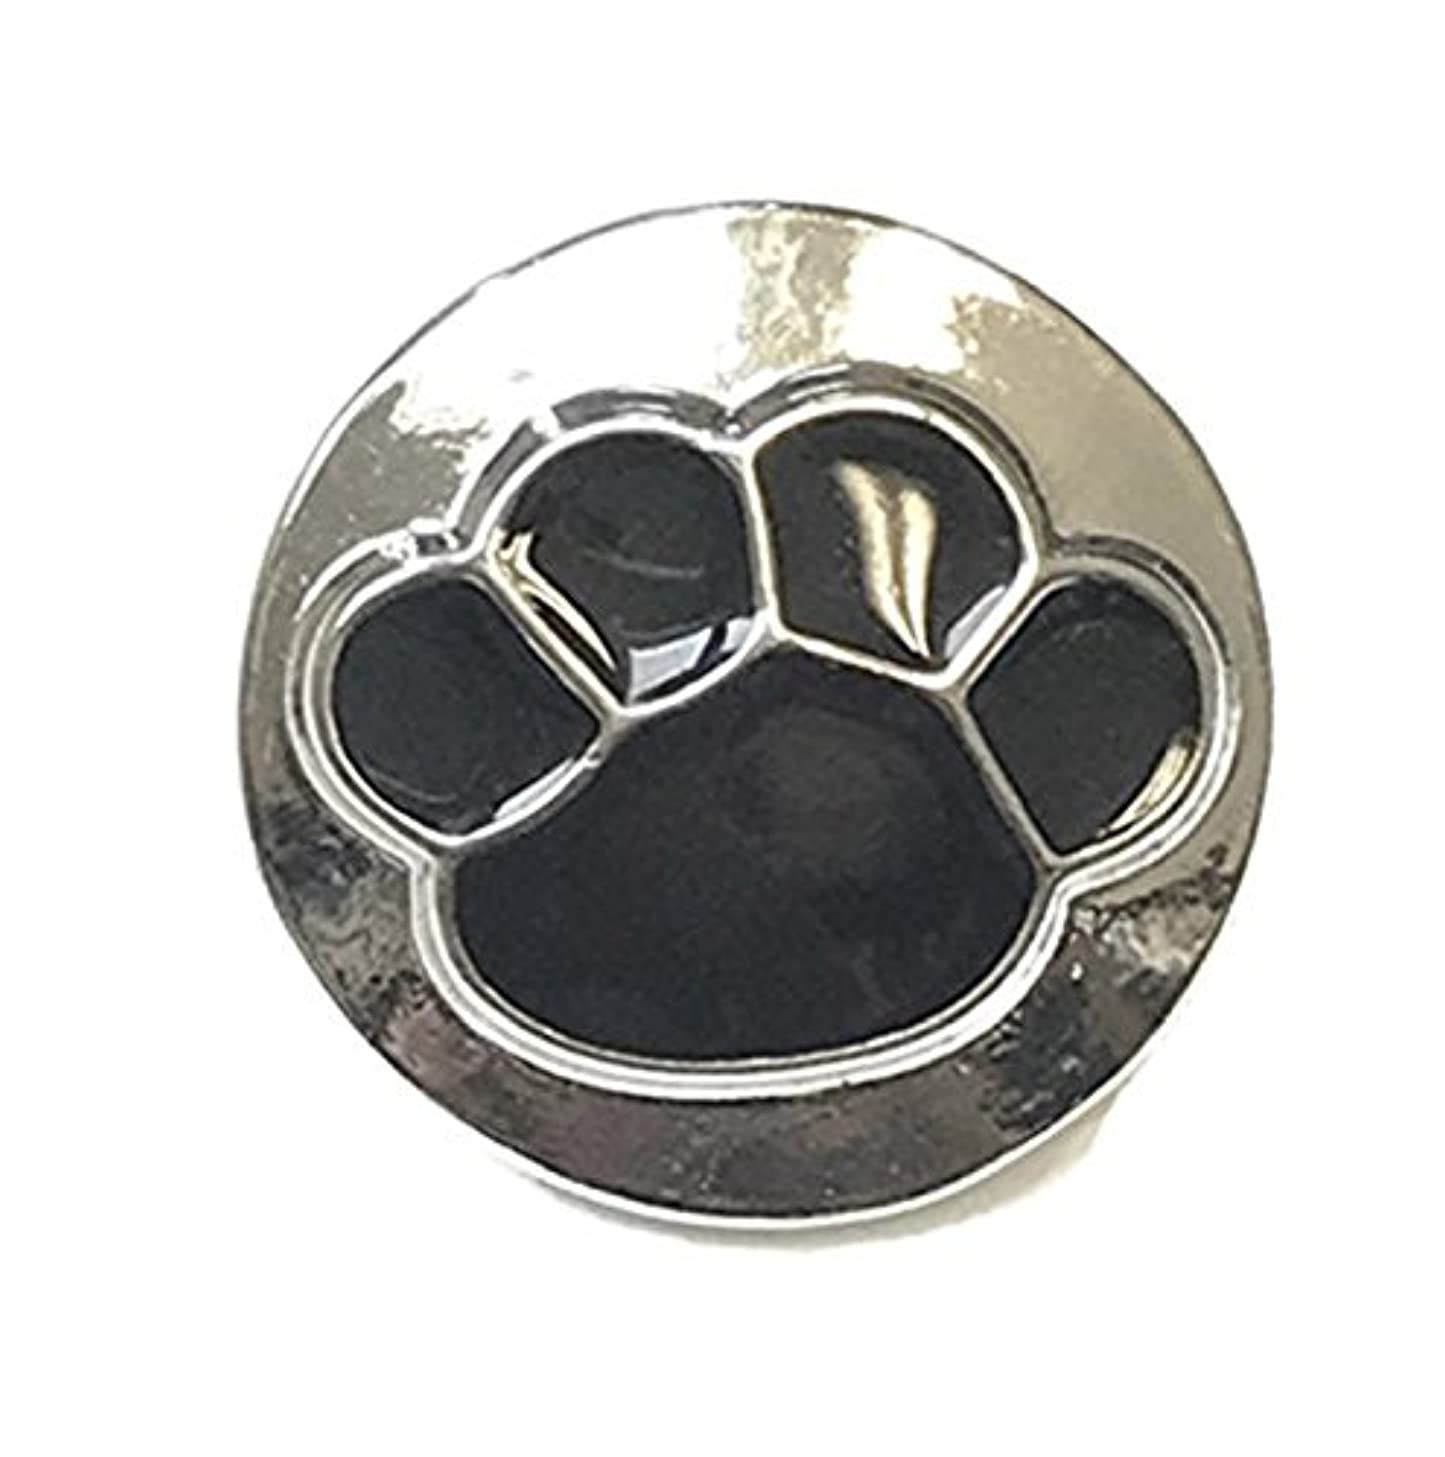 My Prime Gifts Snap Jewelry Enamel Dog Paw Print Black Standard Size 18-20 mm Charm